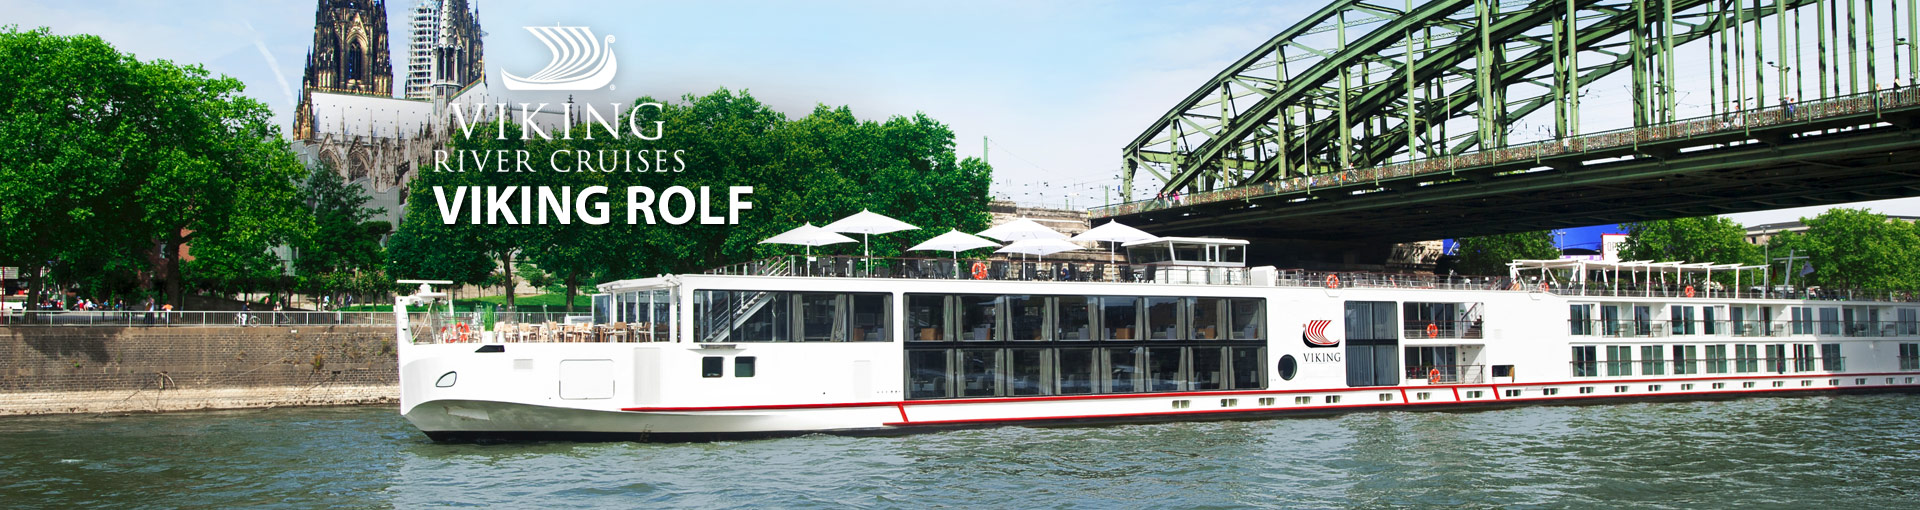 Viking Rivers Viking Rolf river cruise ship